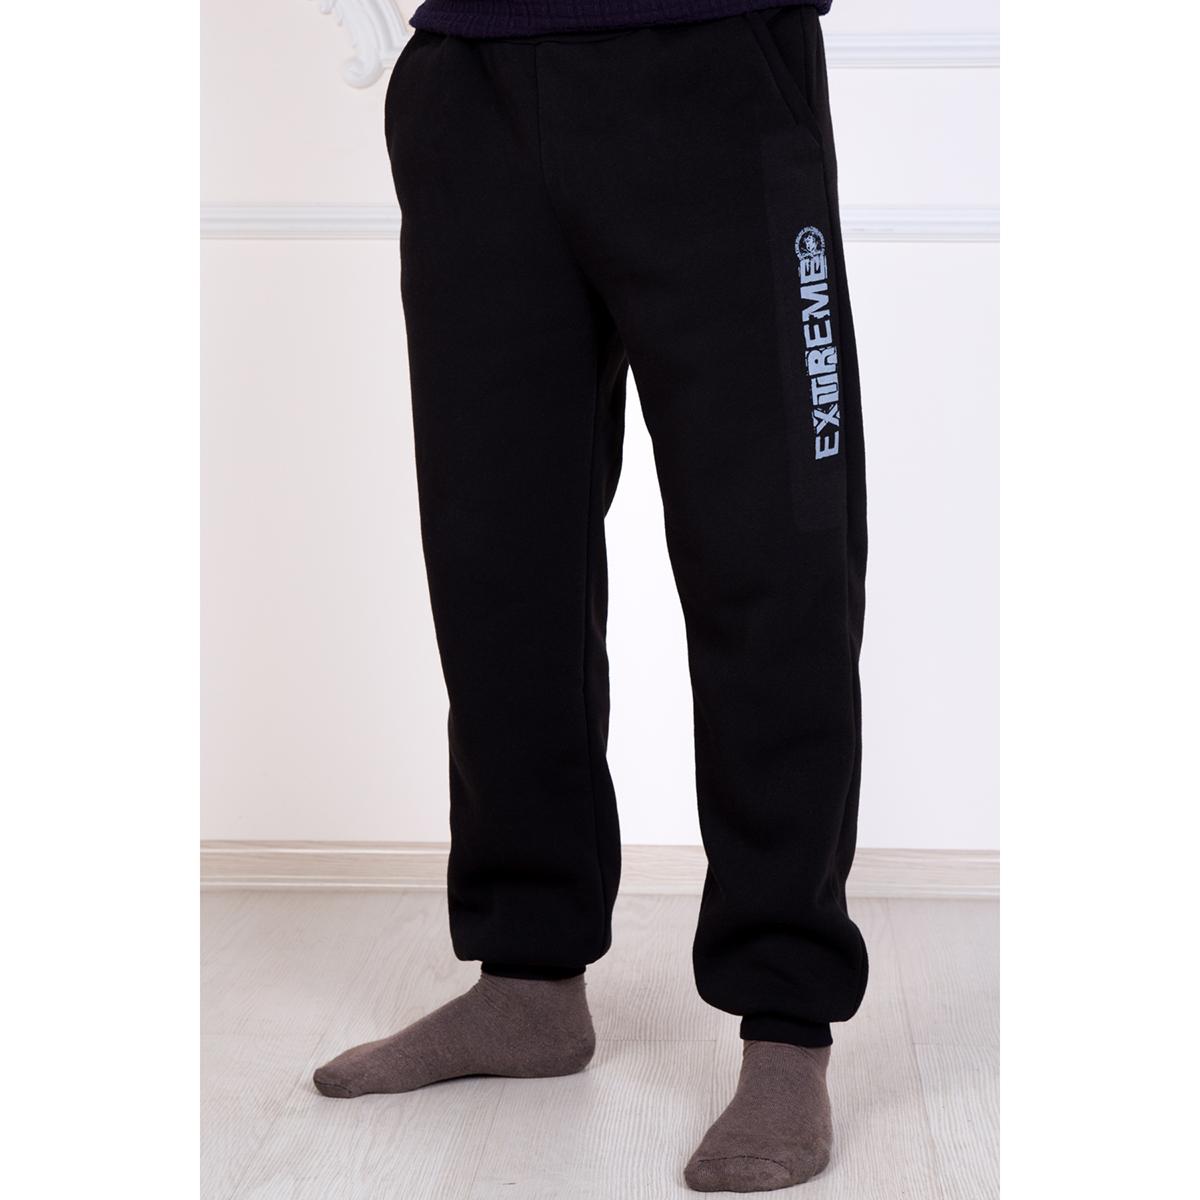 Мужские брюки  Экстрим , размер 54 - Мужская одежда артикул: 16192